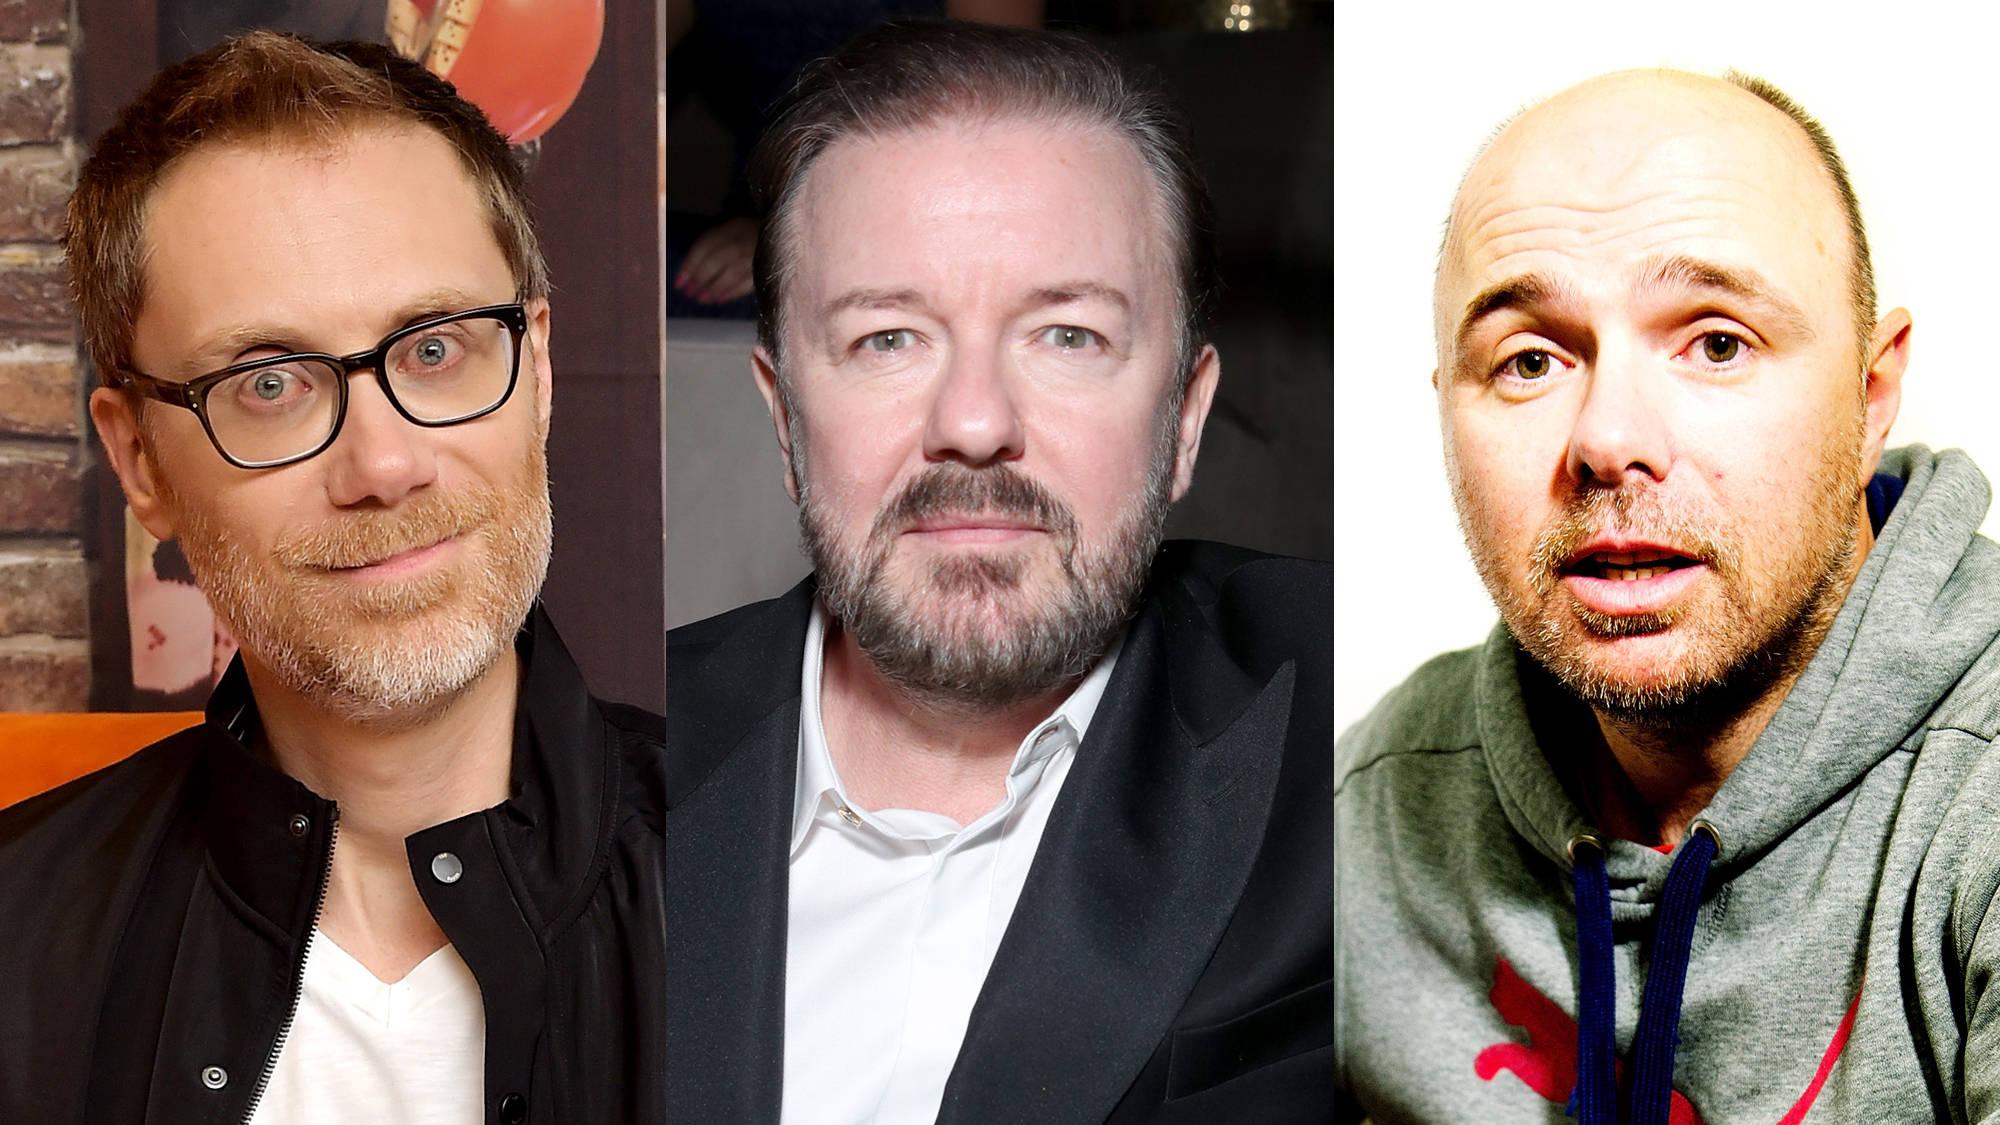 Are Ricky Gervais, Stephen Merchant & Karl Pilkington still friends?